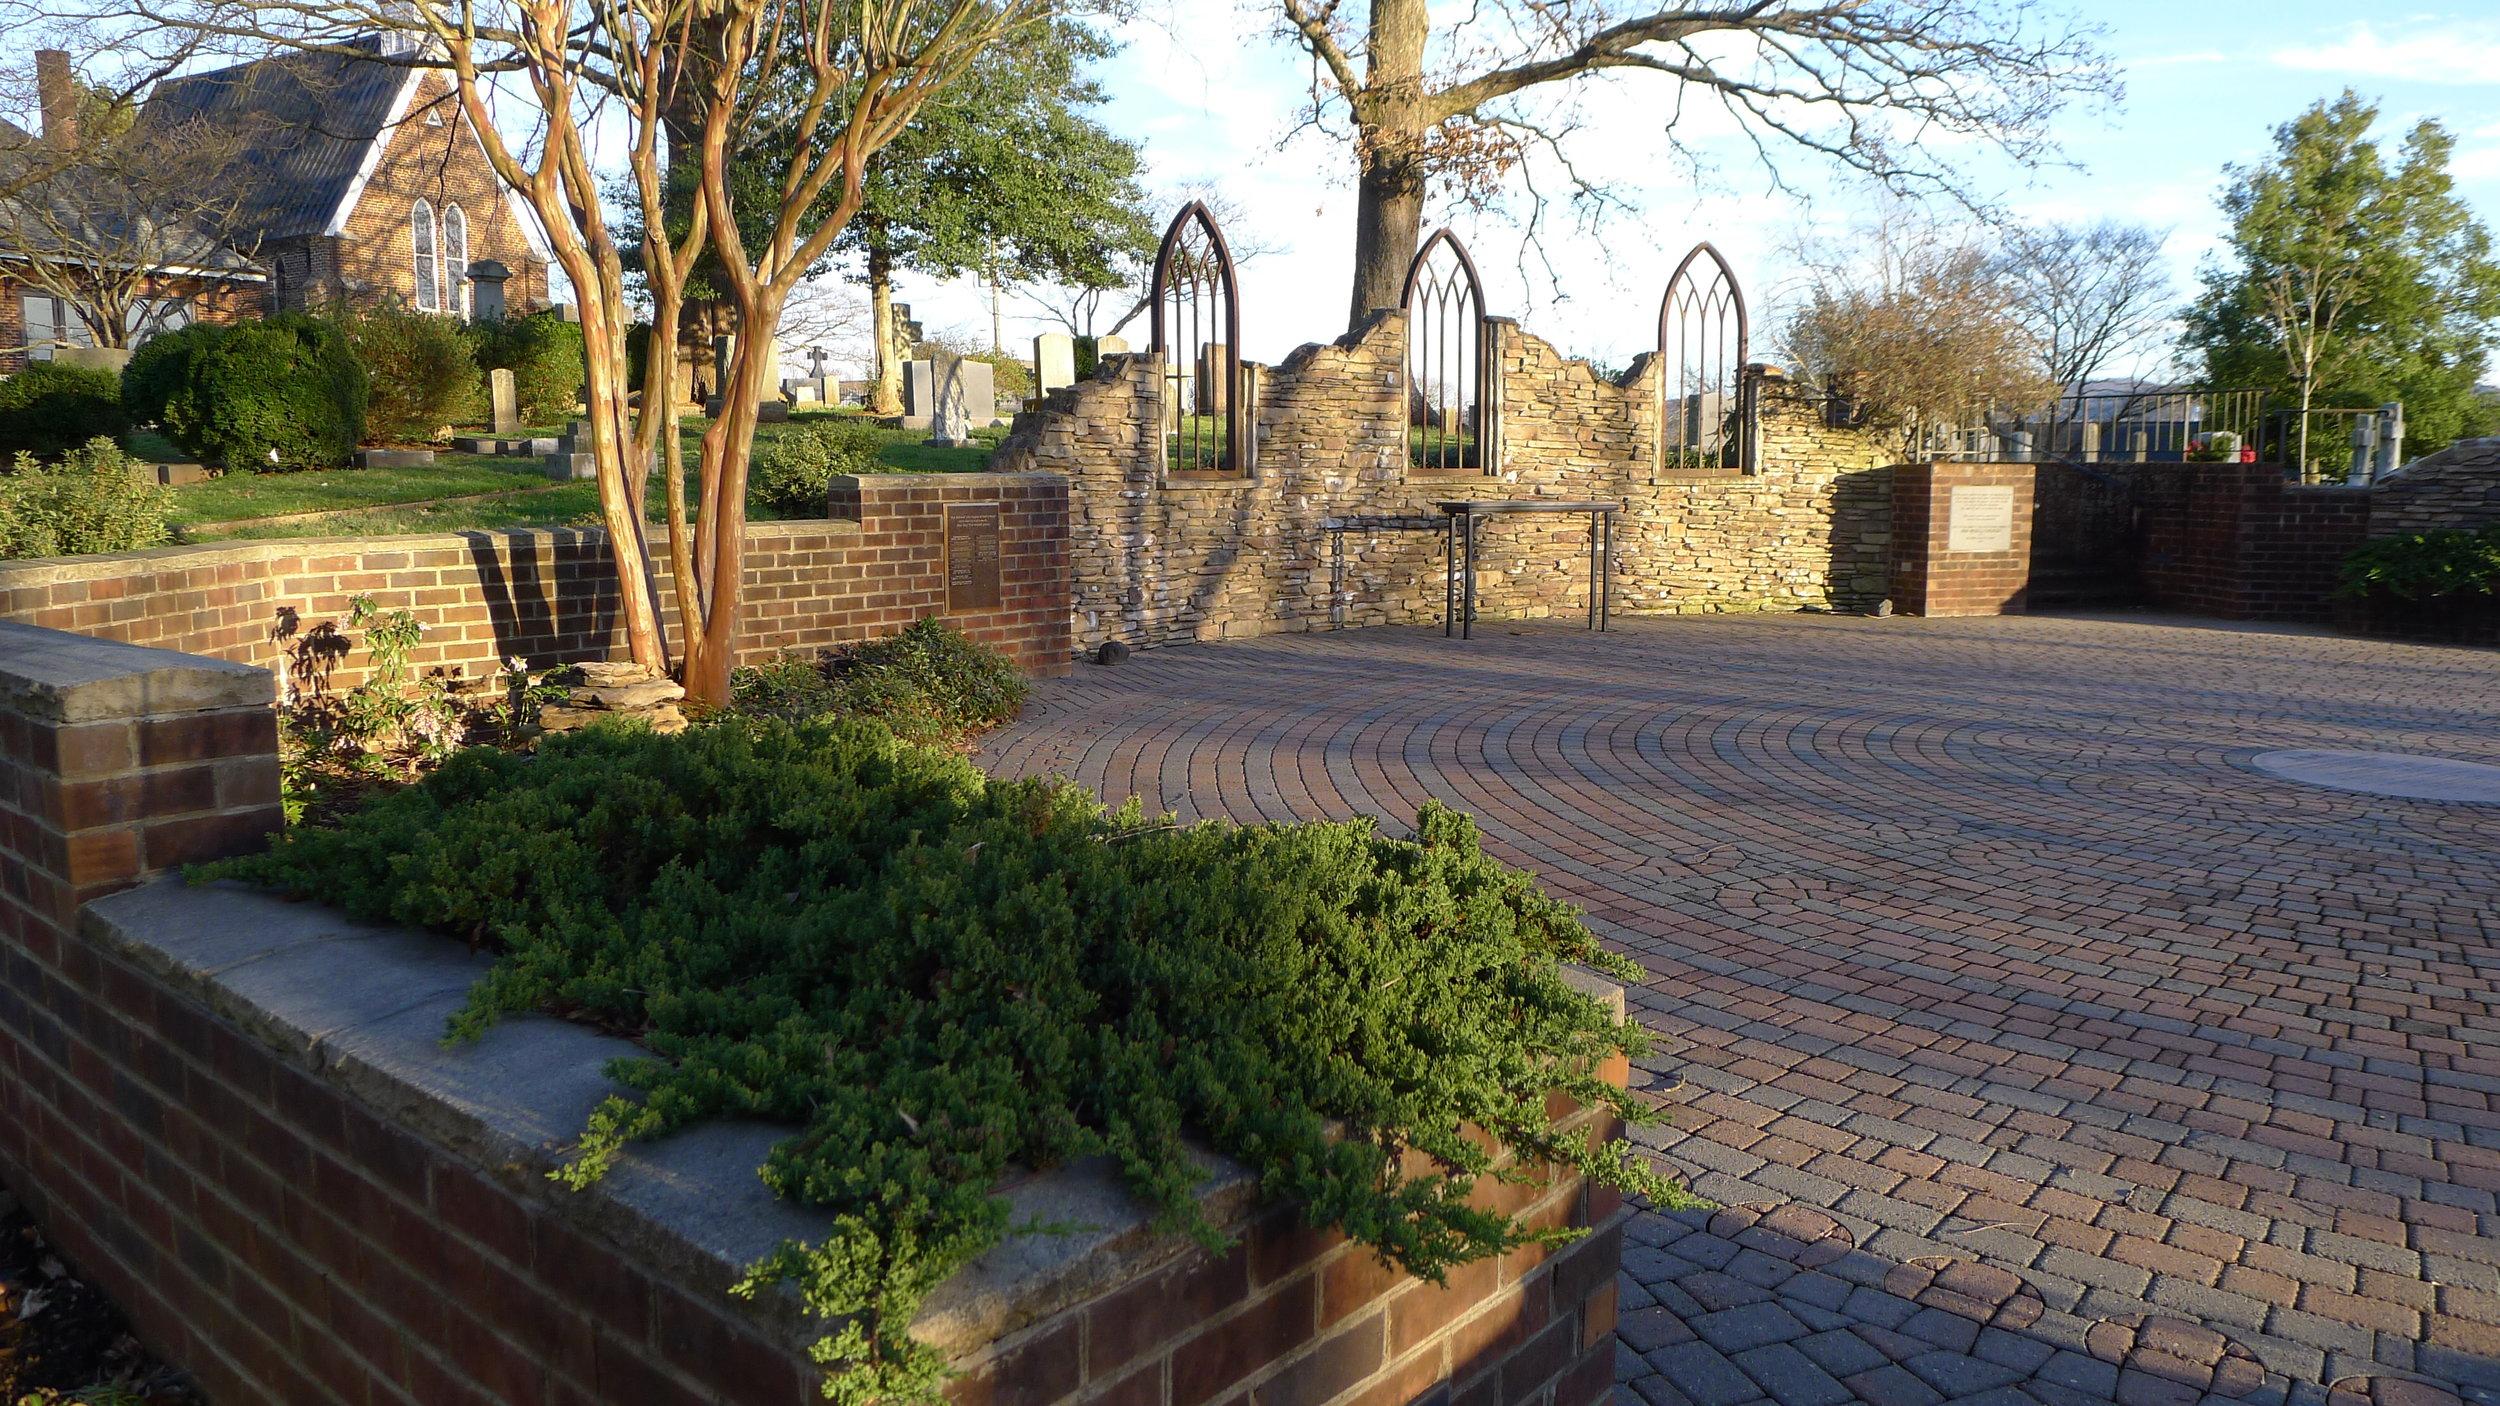 Photo by Sheree Sloop: Labyrinth @ St. Paul's, Wilkesboro